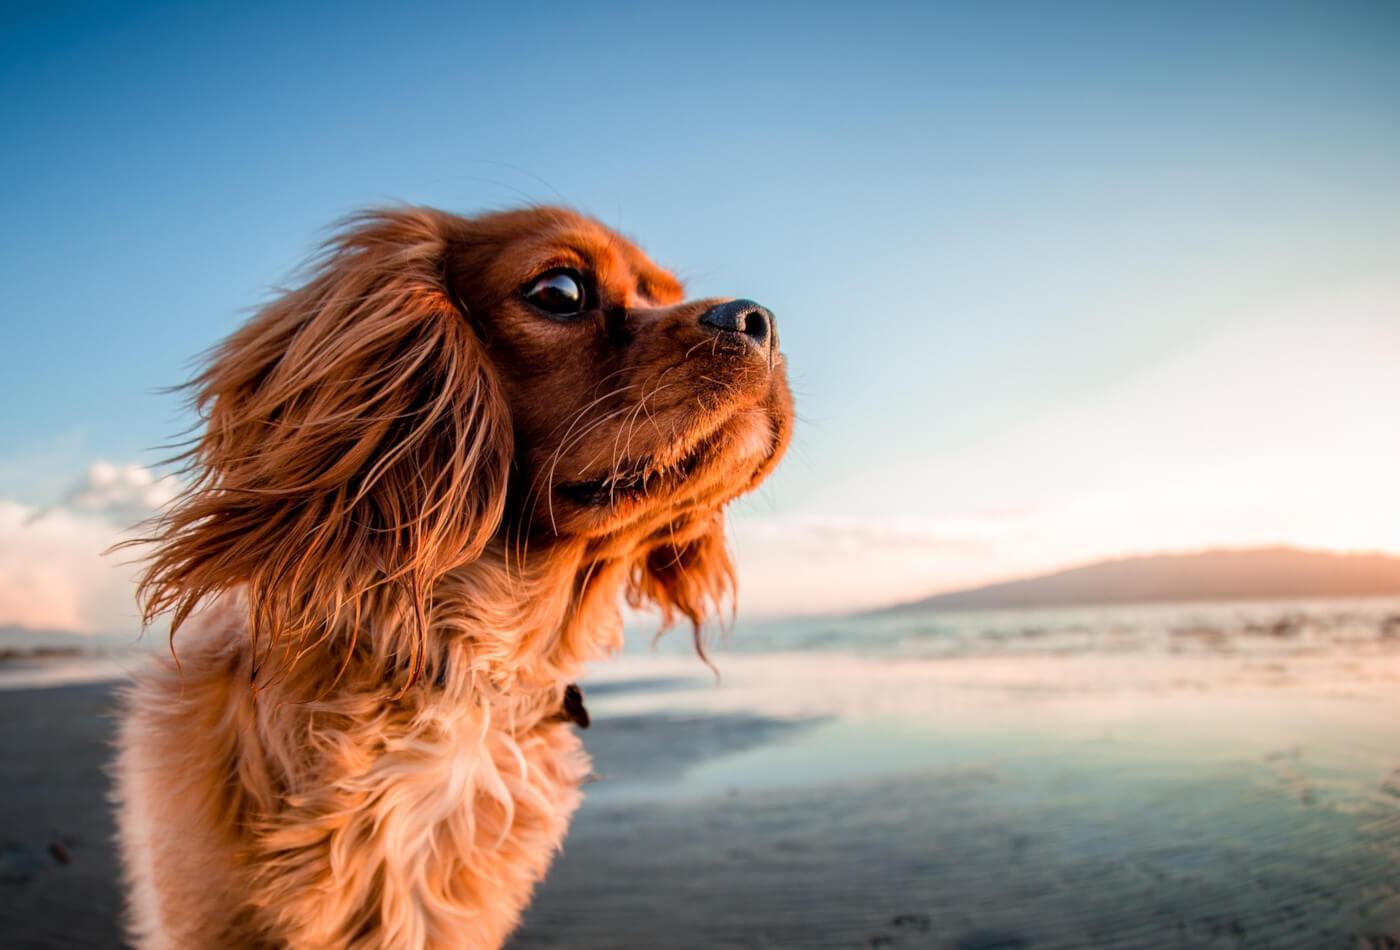 Wondrous Dog Friendly Beaches In Dorset Our Top Picks Dream Cottages Download Free Architecture Designs Embacsunscenecom